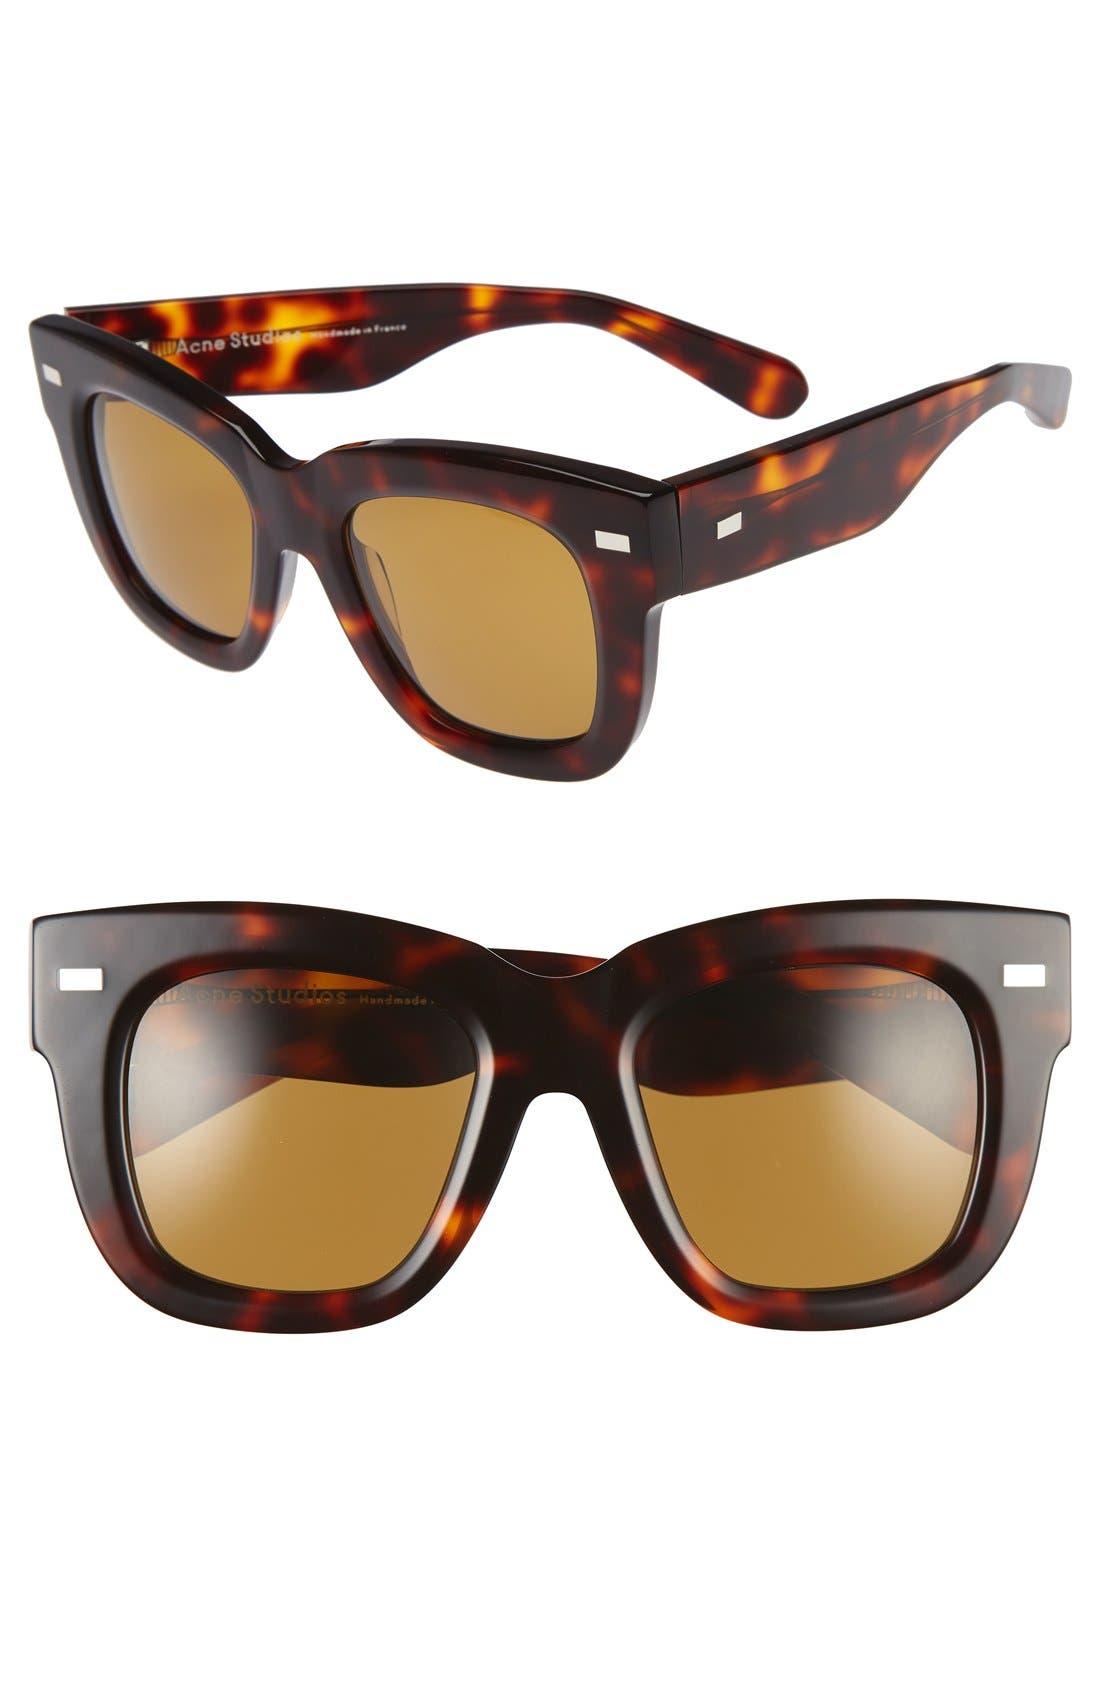 Main Image - Acne Studios Library 51mm Sunglasses